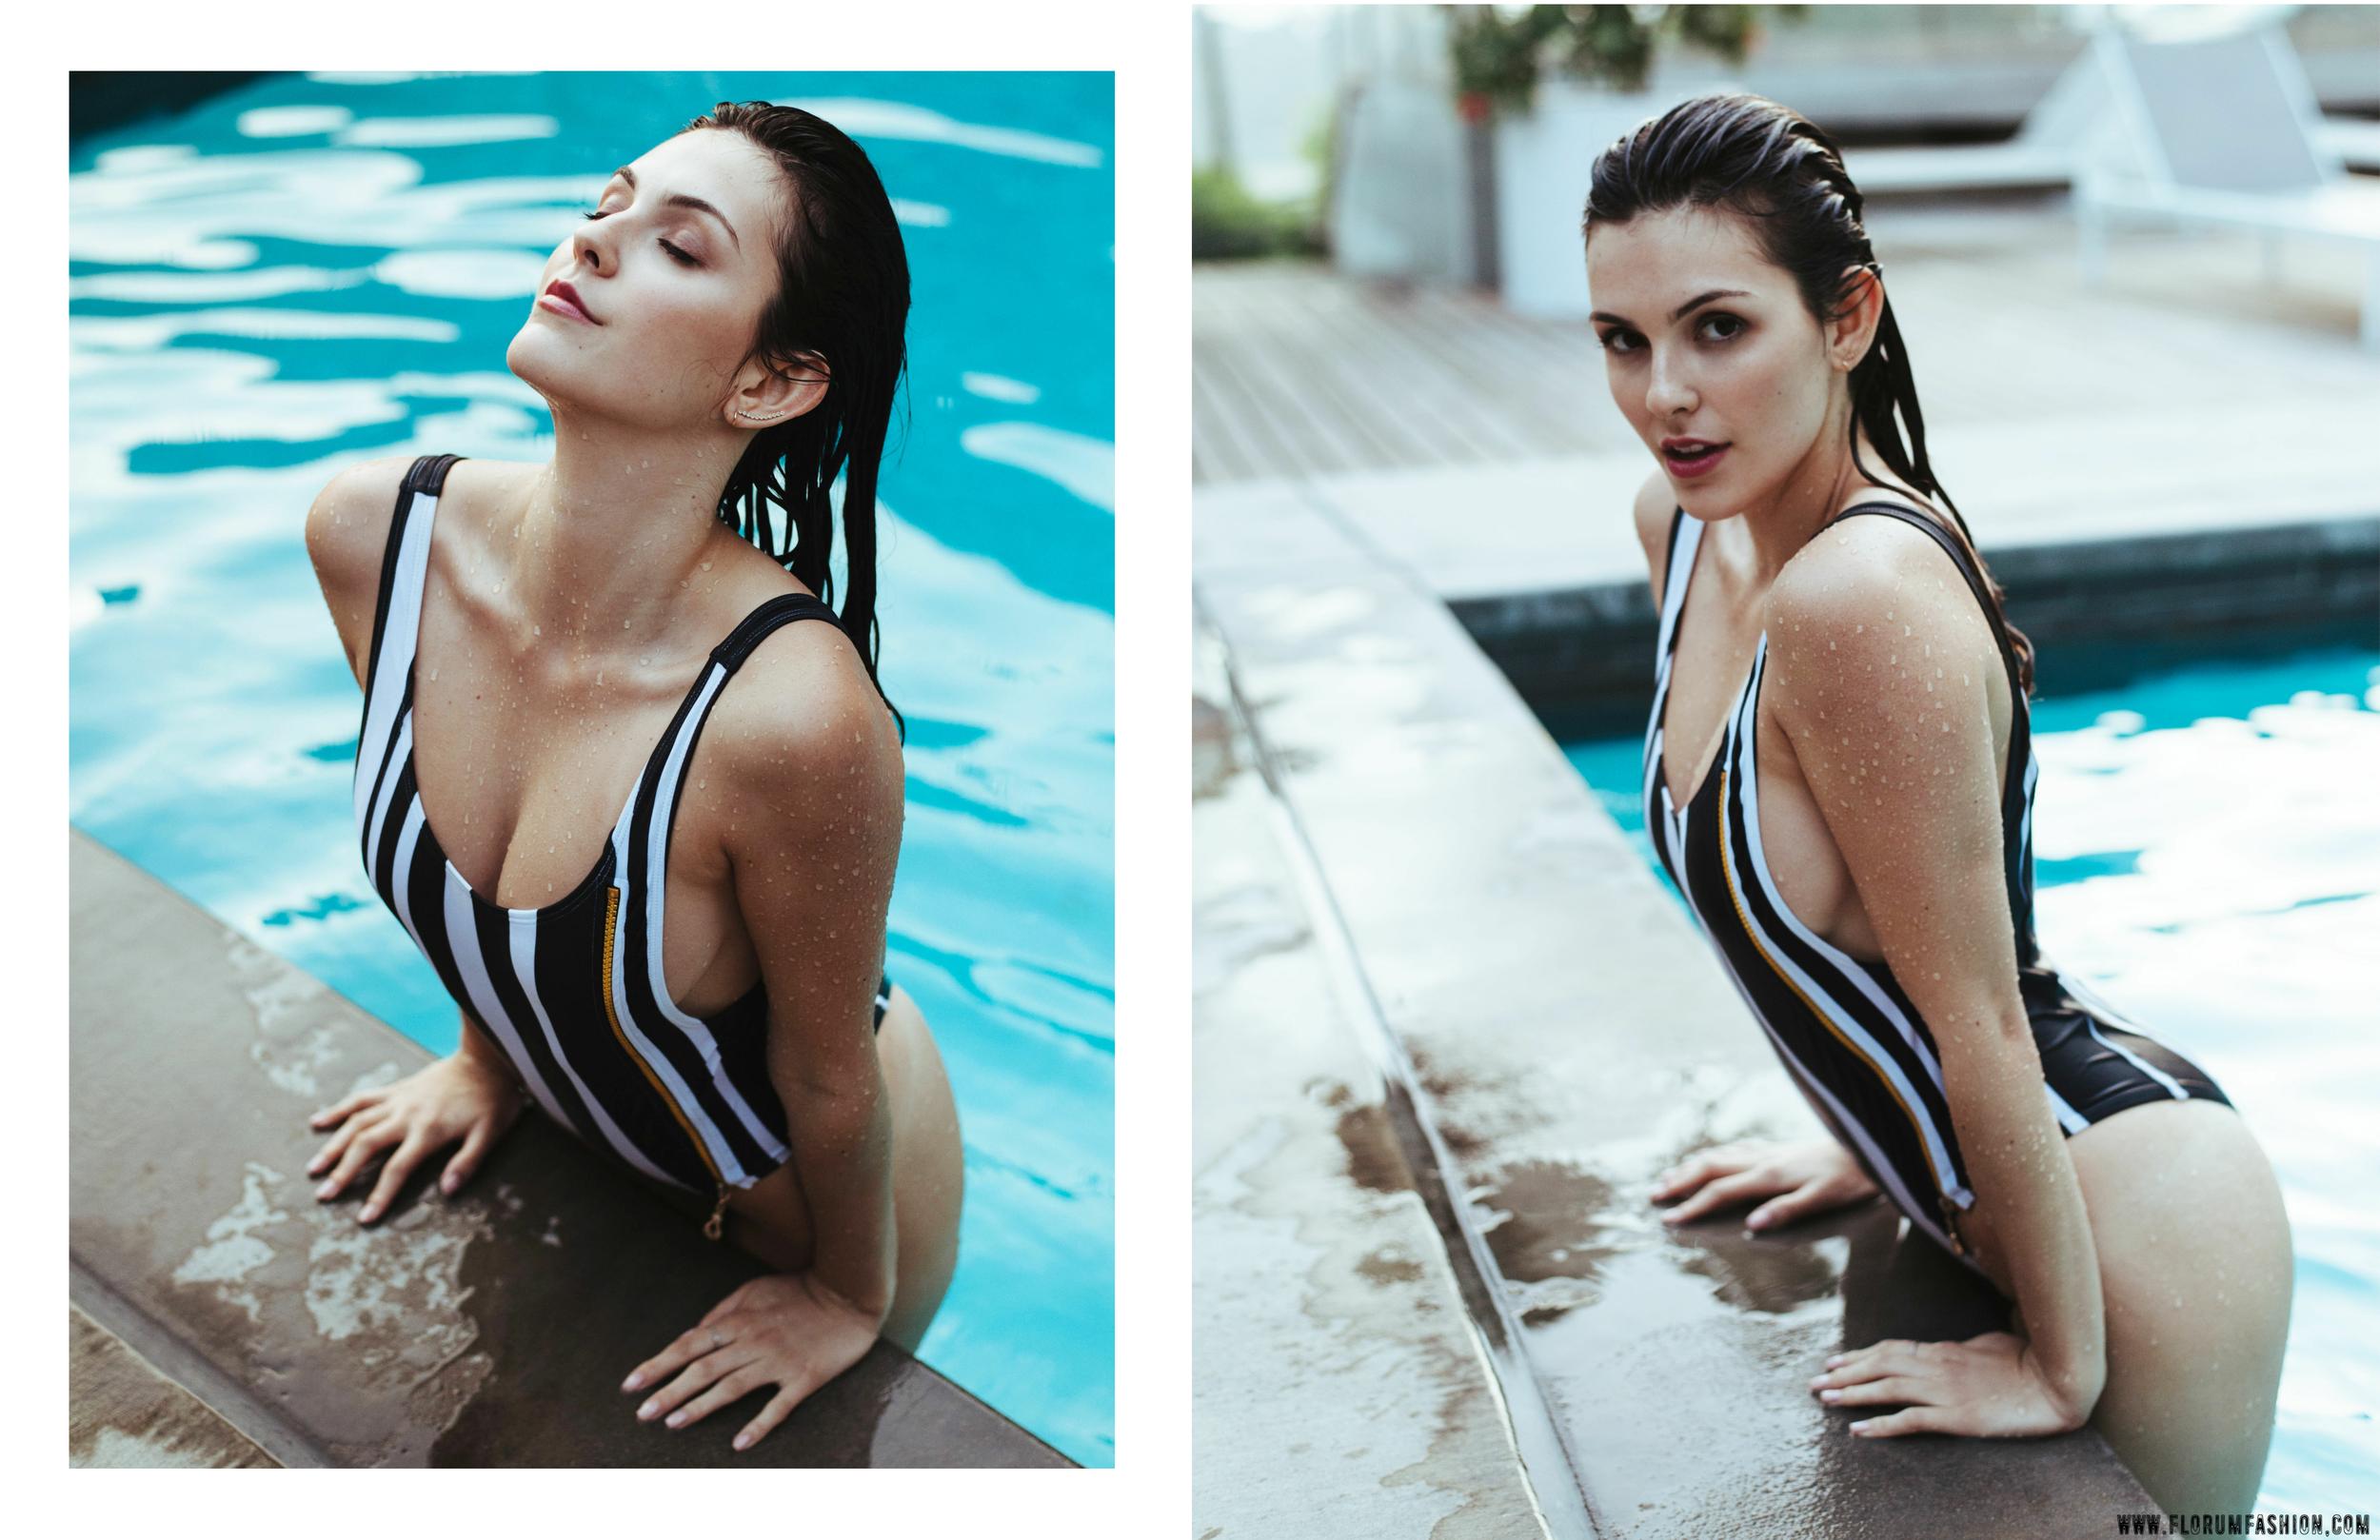 Charlotte Elizabeth Clough Luxury Swimwear - Florum Fashion Magazine - Stephen Sun - Julia Friedman - Photogenics LA - Slow Fashion - Ethical Fashion - Green Bikini